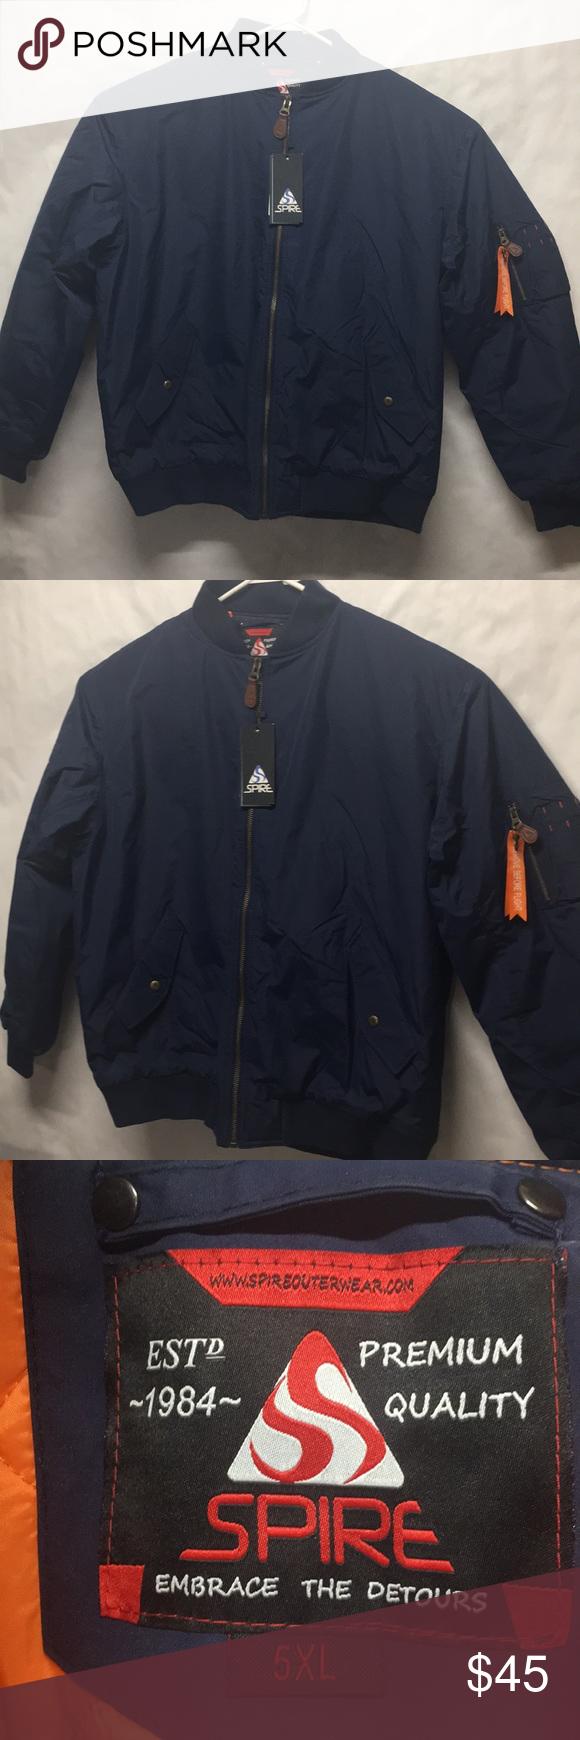 Men S Flight Jacket Sz5xl Navy Blue Quilted Flight Jacket Navy Blue Quilt Mens Flight Jacket [ 1740 x 580 Pixel ]